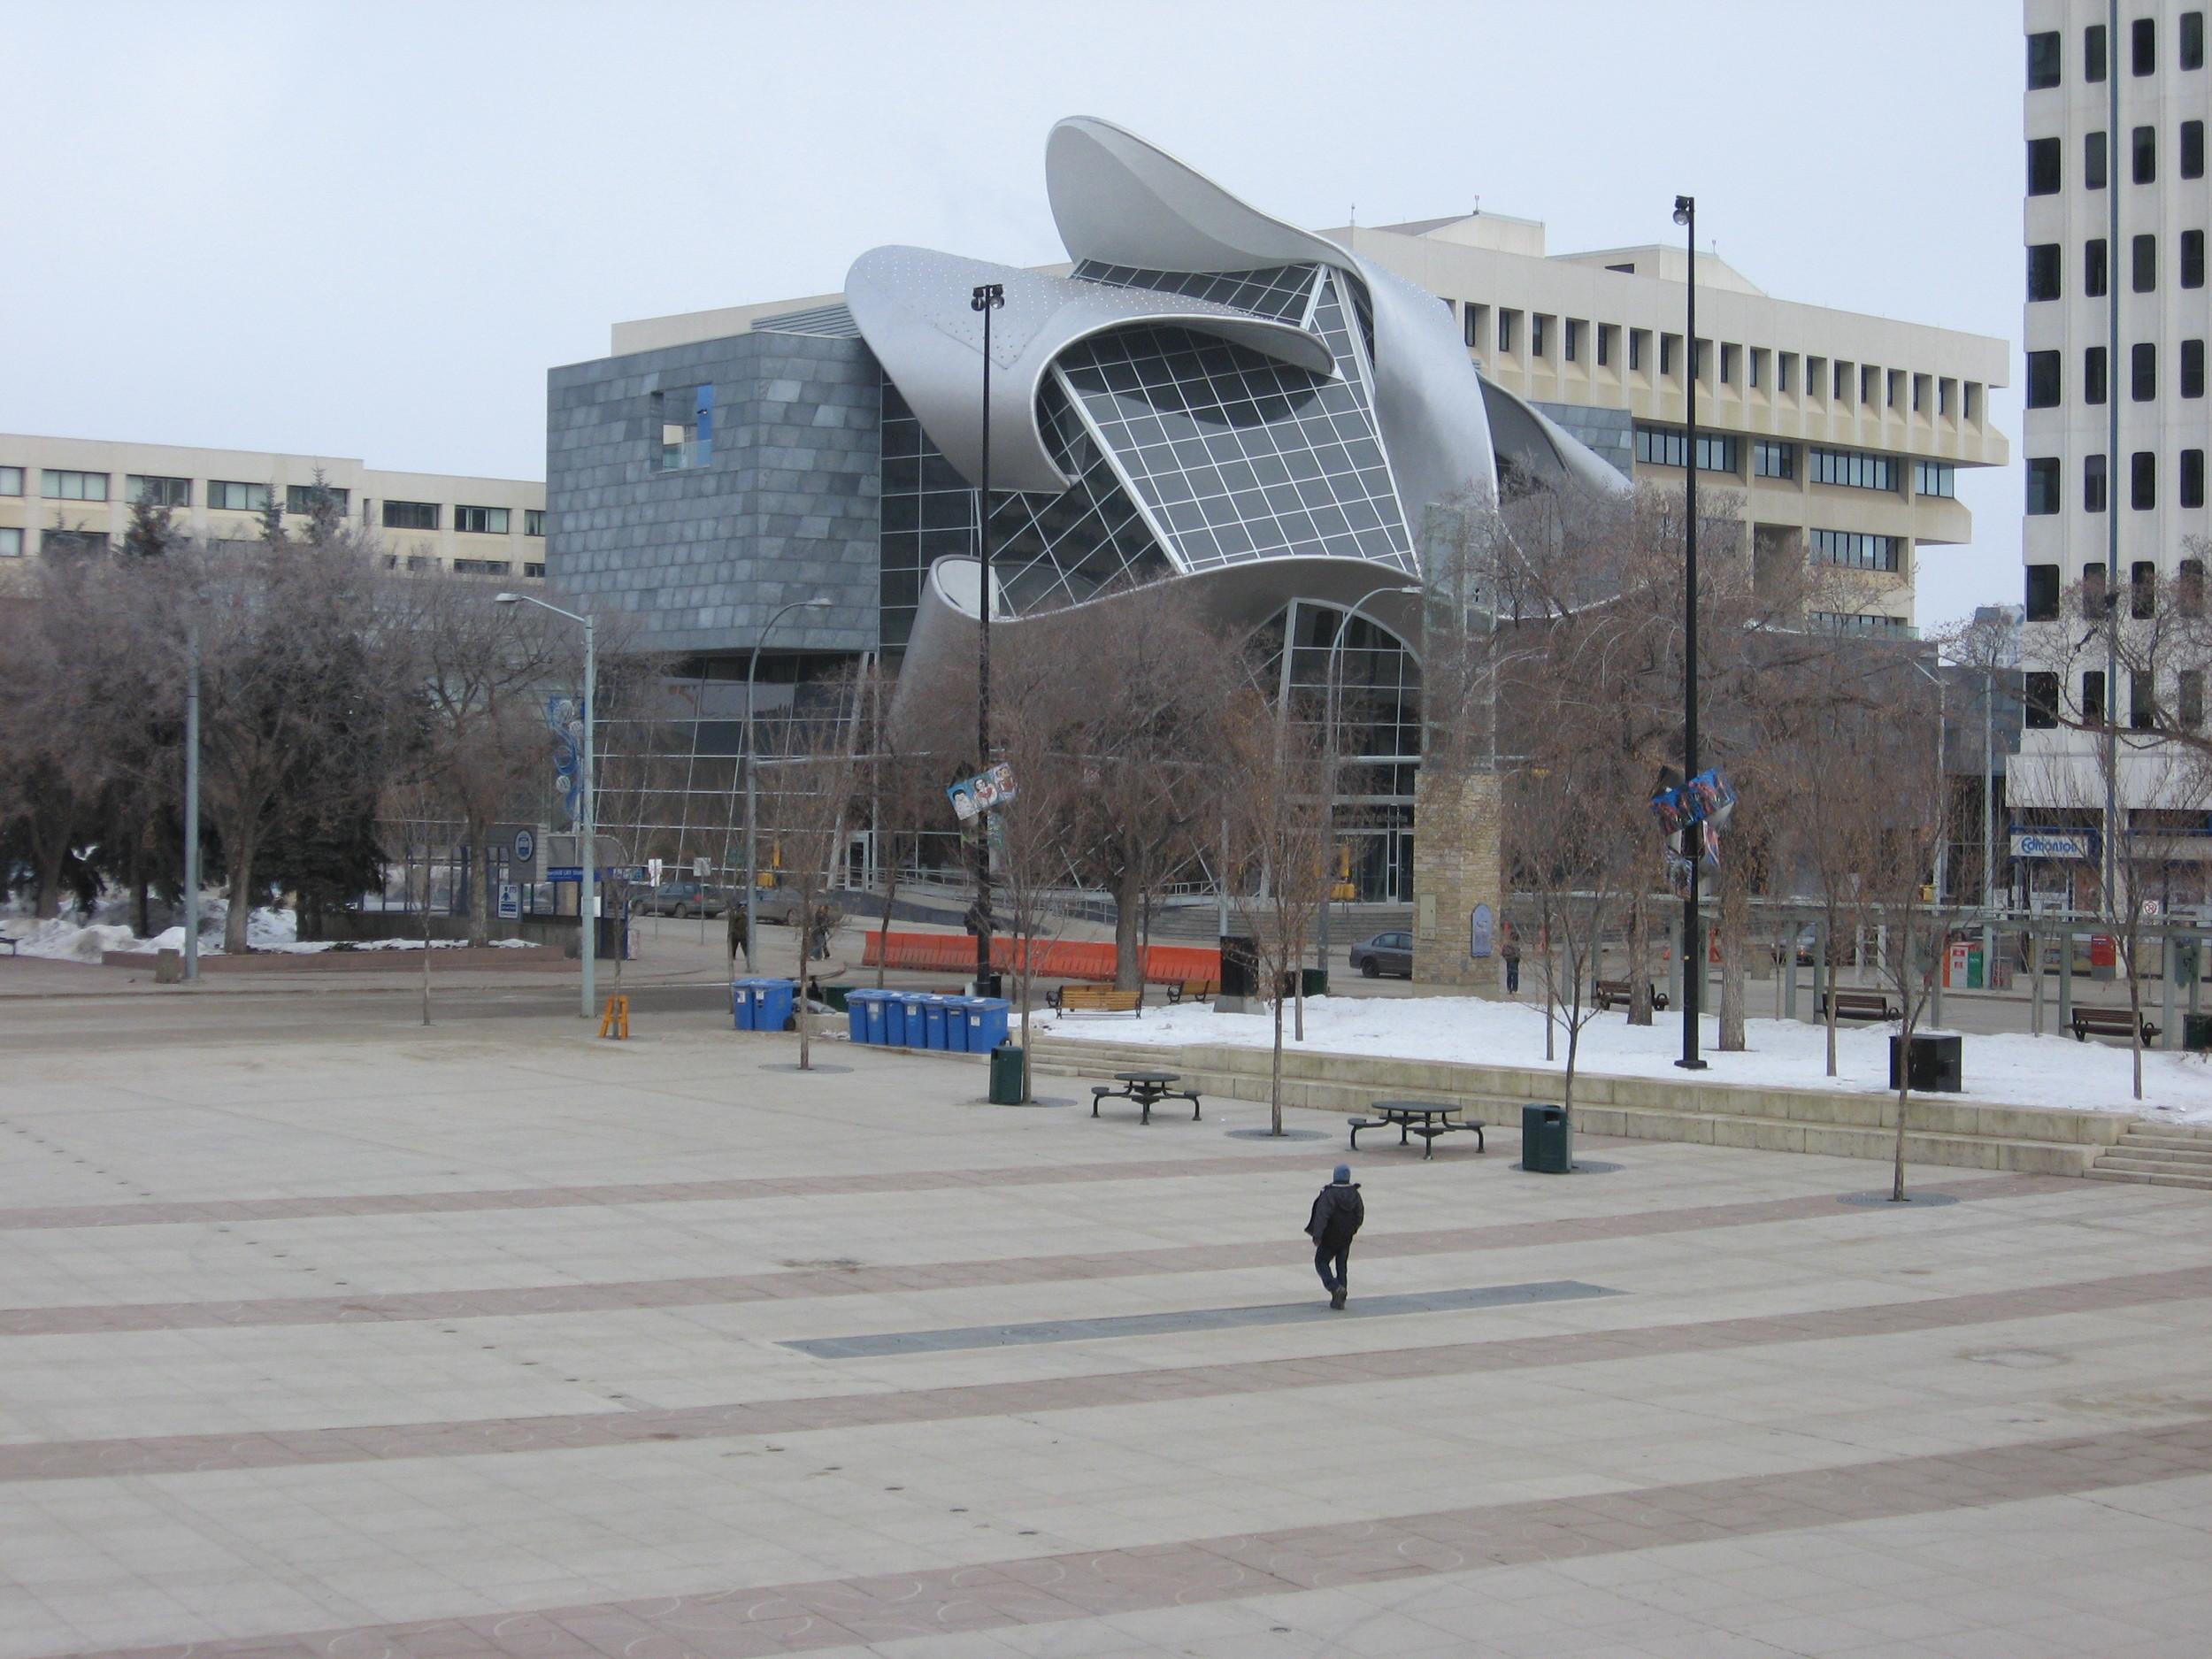 Edmonton's Art Gallery of Alberta and Churchill Square in February.